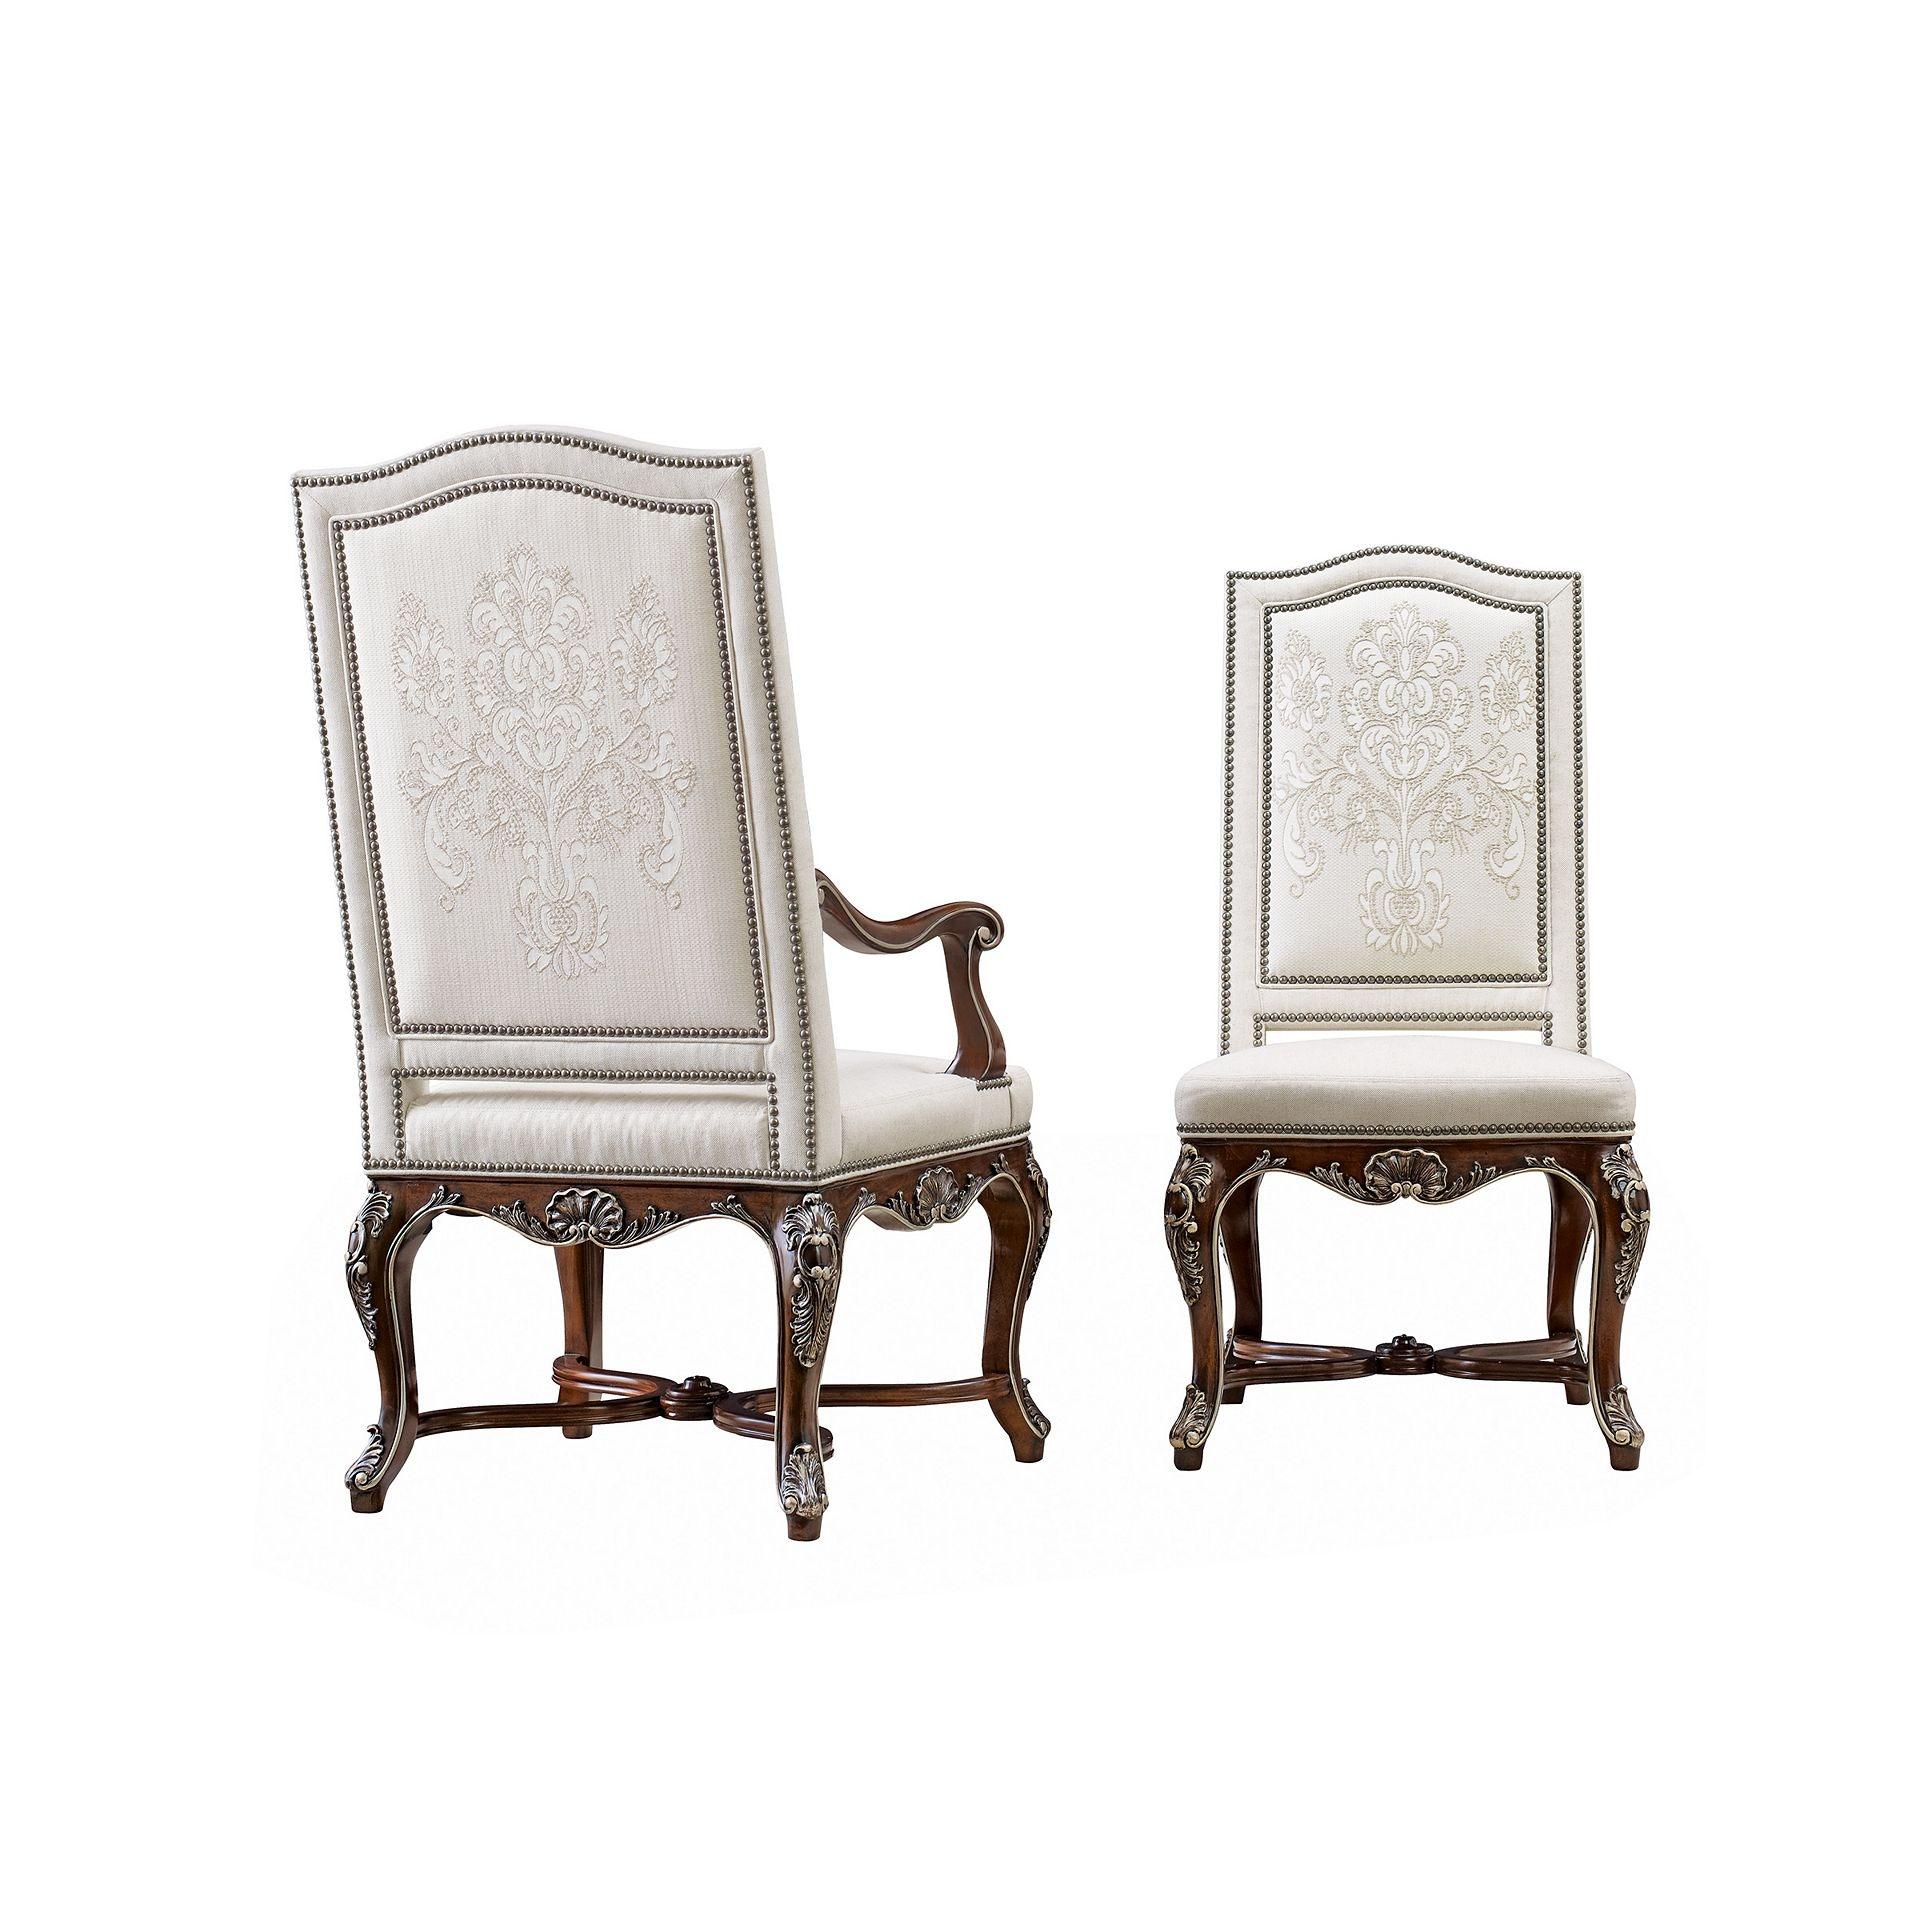 henredon furniture henredon upholstery marseilles arm chair h504127